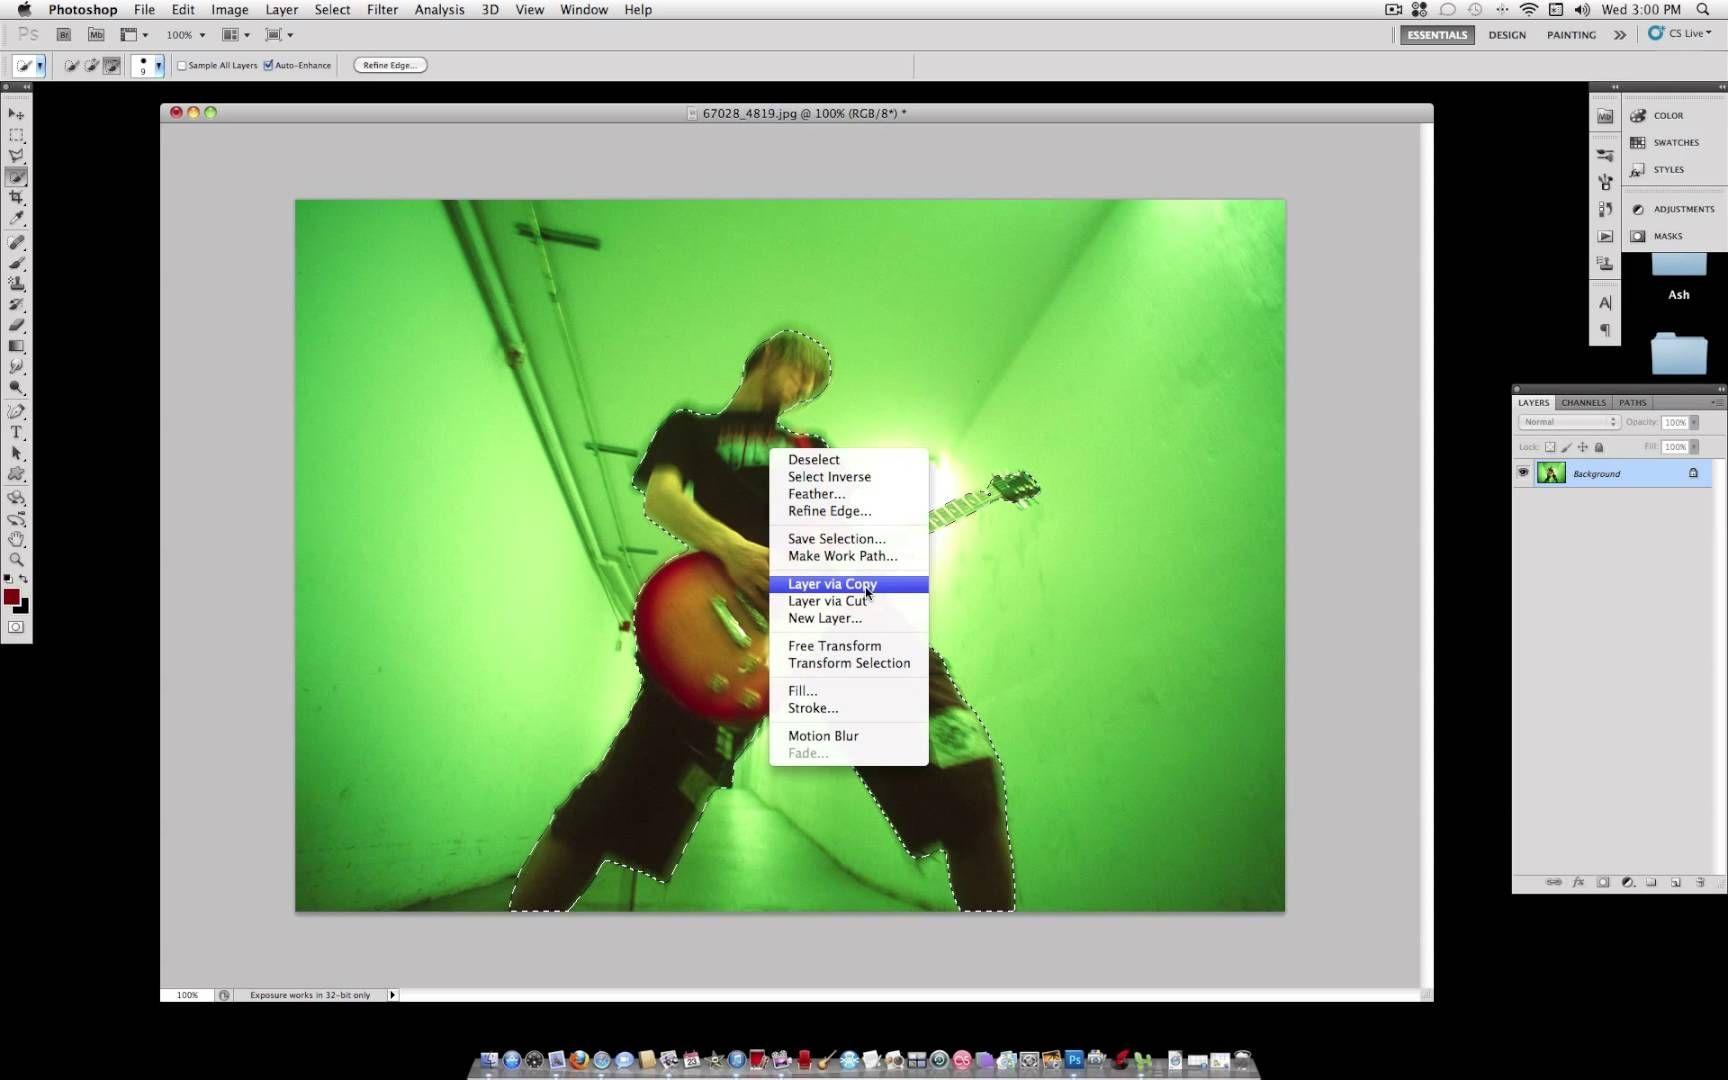 Photoshop cs5 tutorial colorful snl style poster tutor photoshop cs5 tutorial colorful snl style poster baditri Choice Image